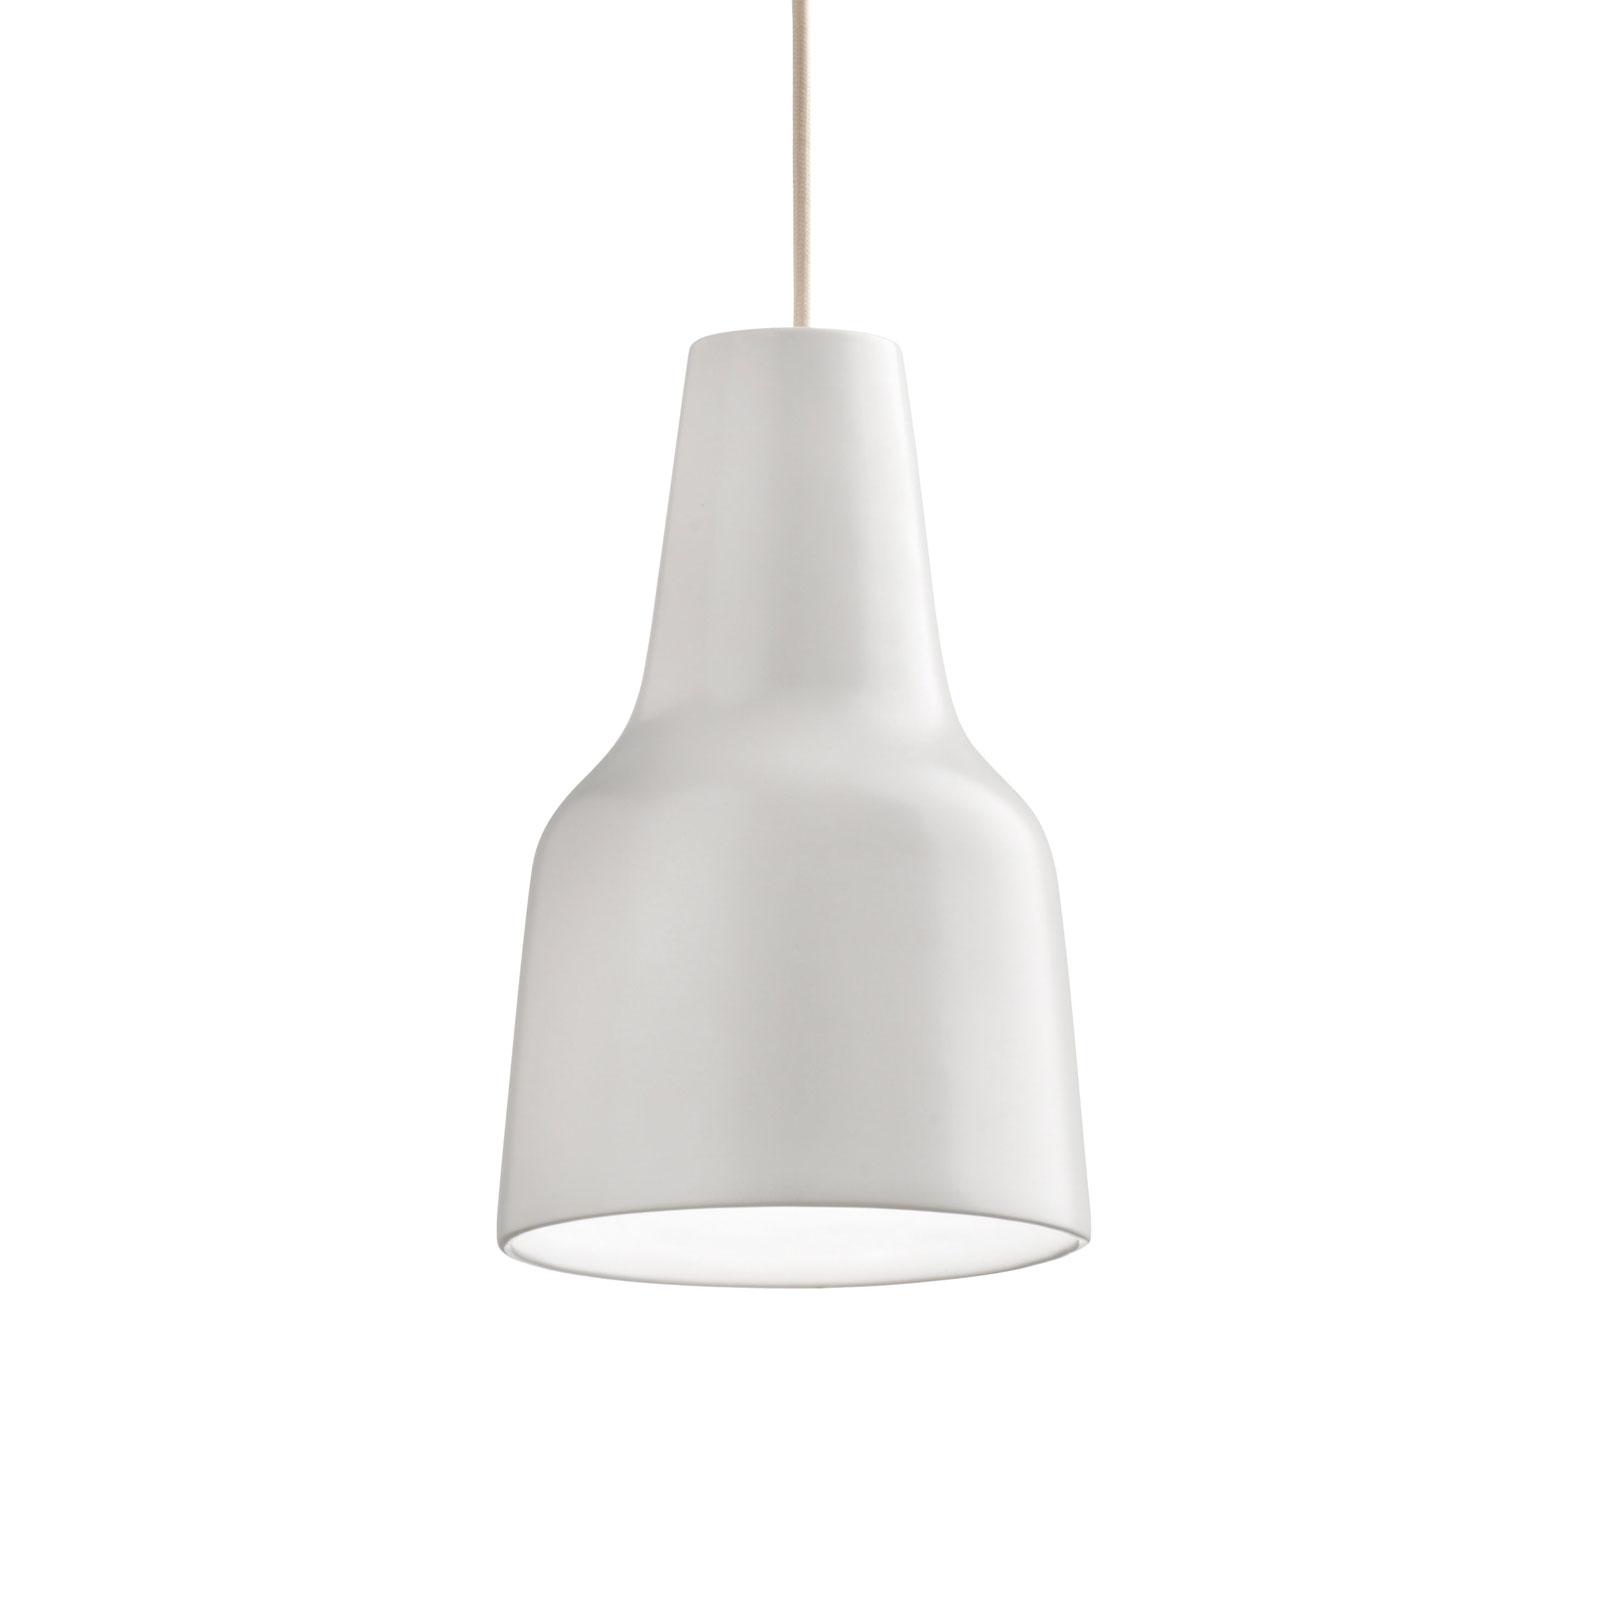 Modo Luce Eva pendellampe Ø 27 cm hvit